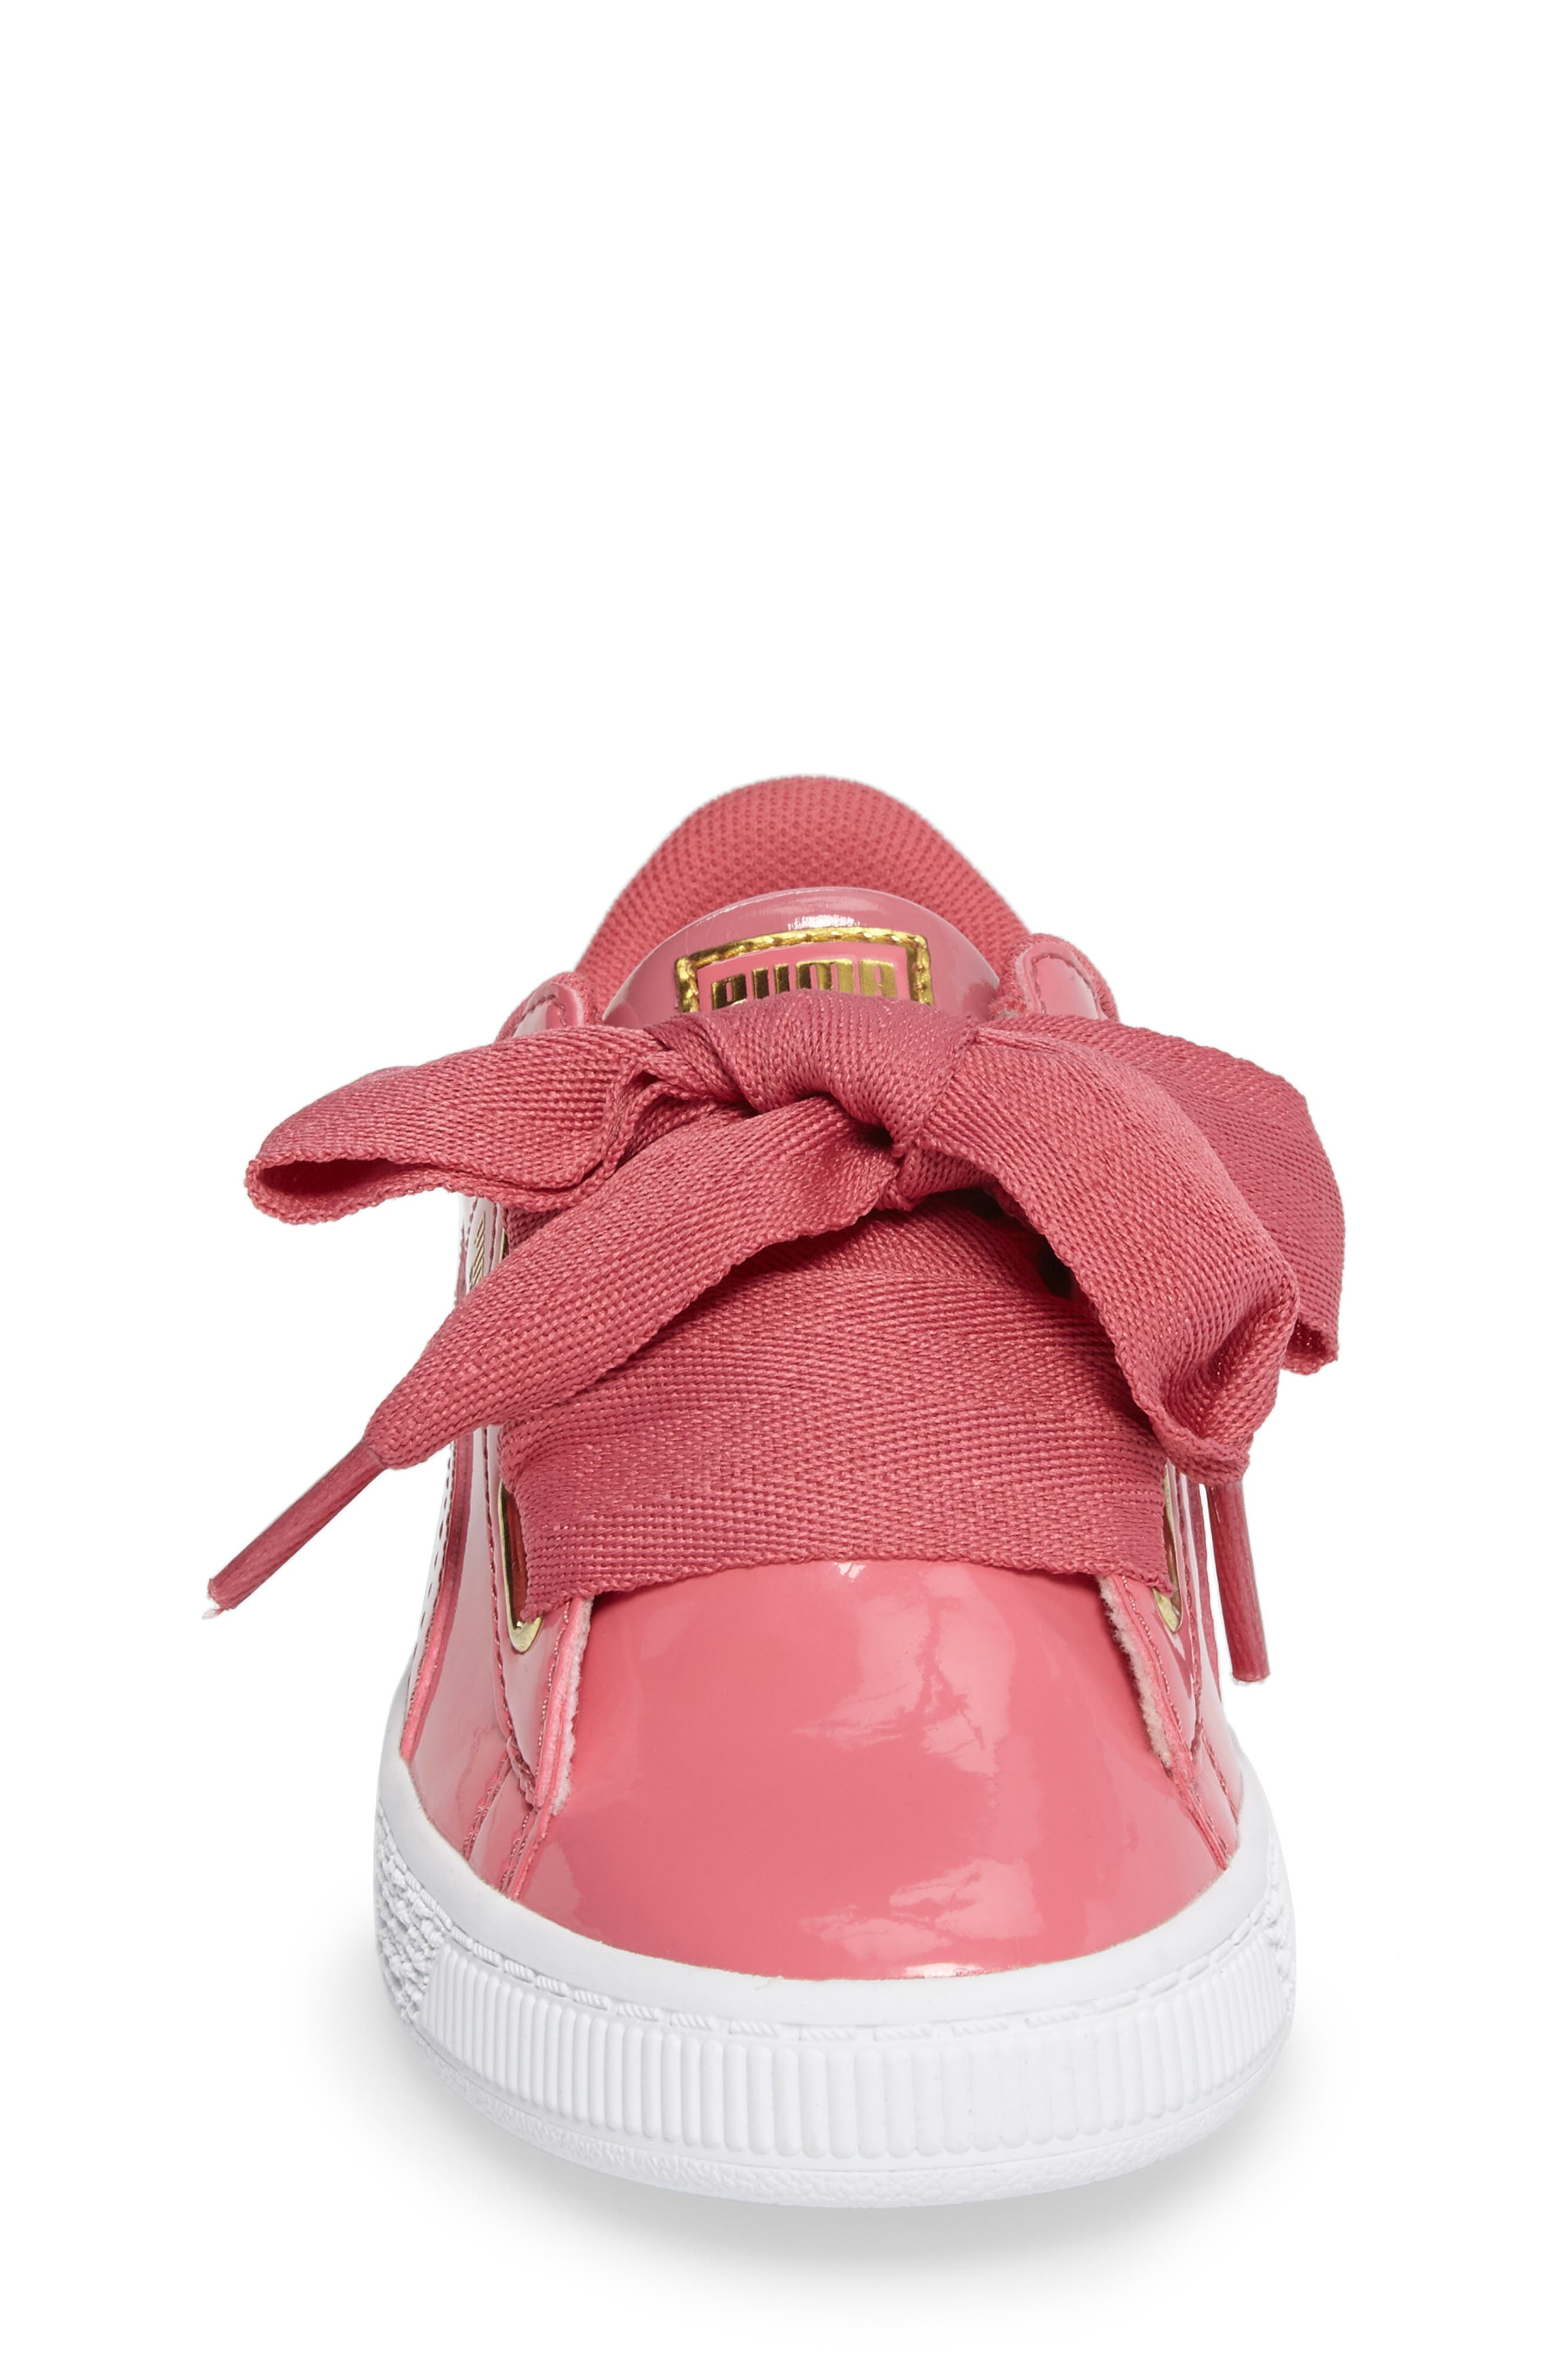 Basket Heart Sneaker,                             Alternate thumbnail 4, color,                             Rapture Rose/ Puma Team Gold